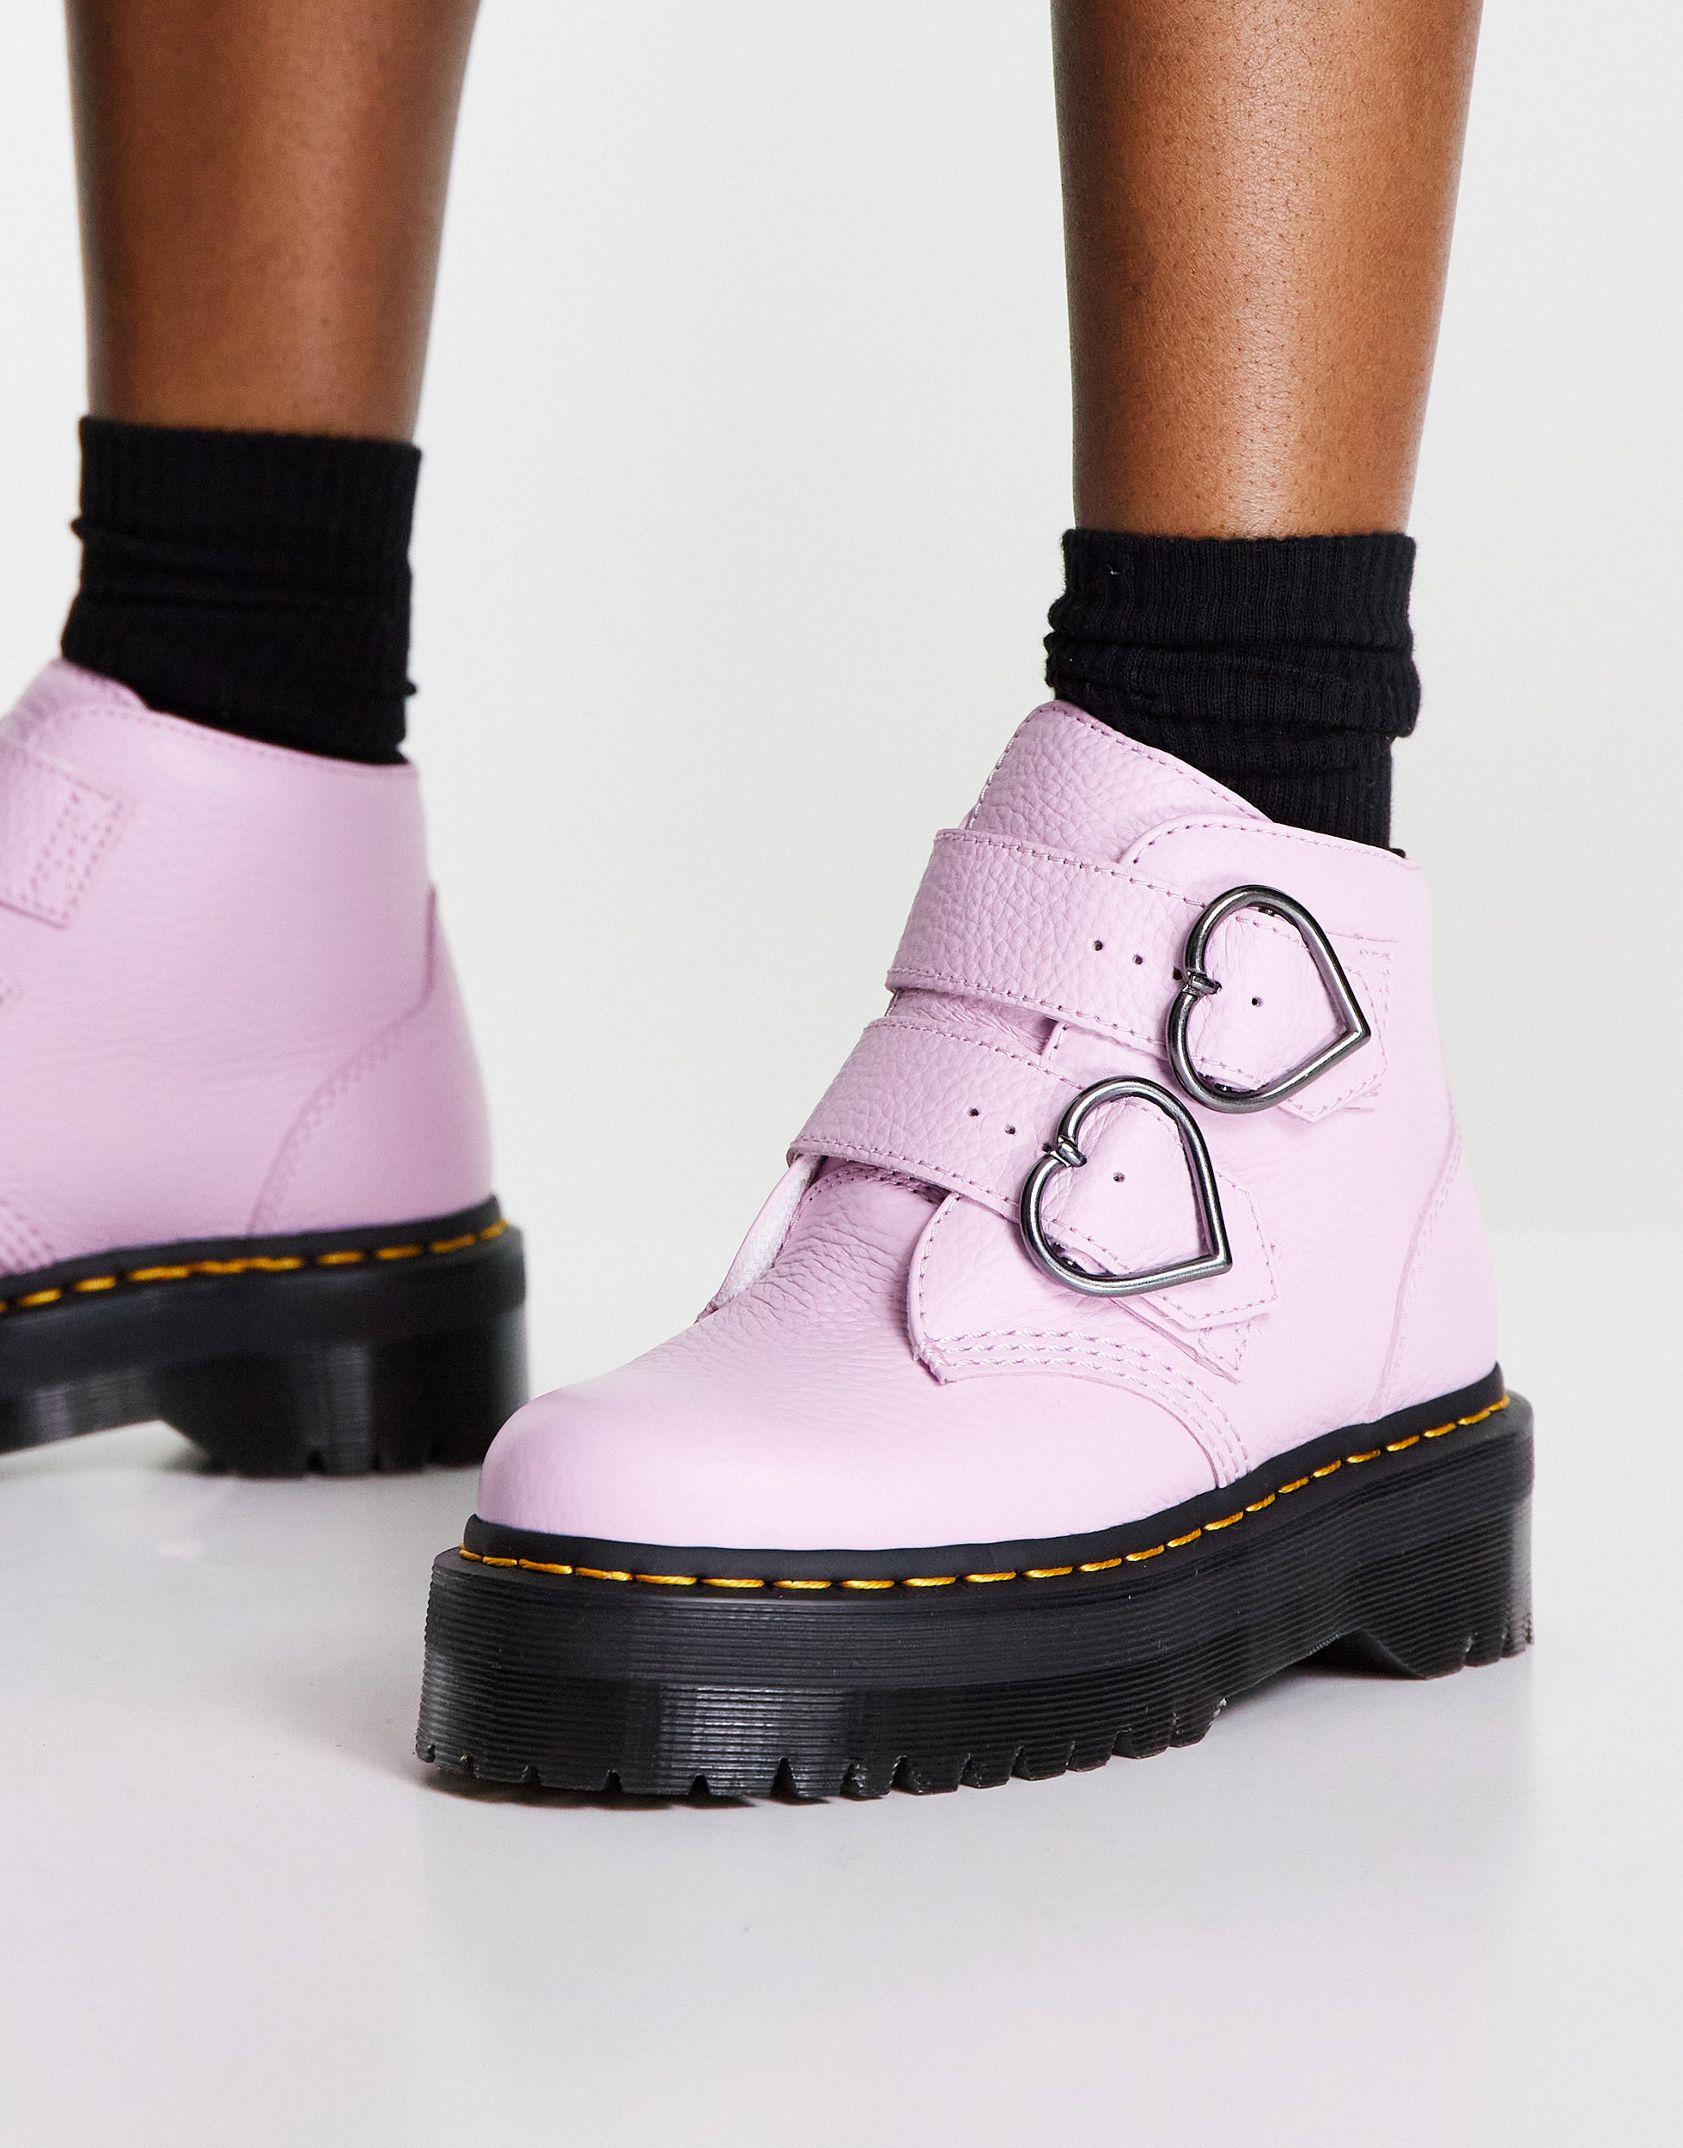 Dr Martens Devon Heart boots in lavender -  Price Checker